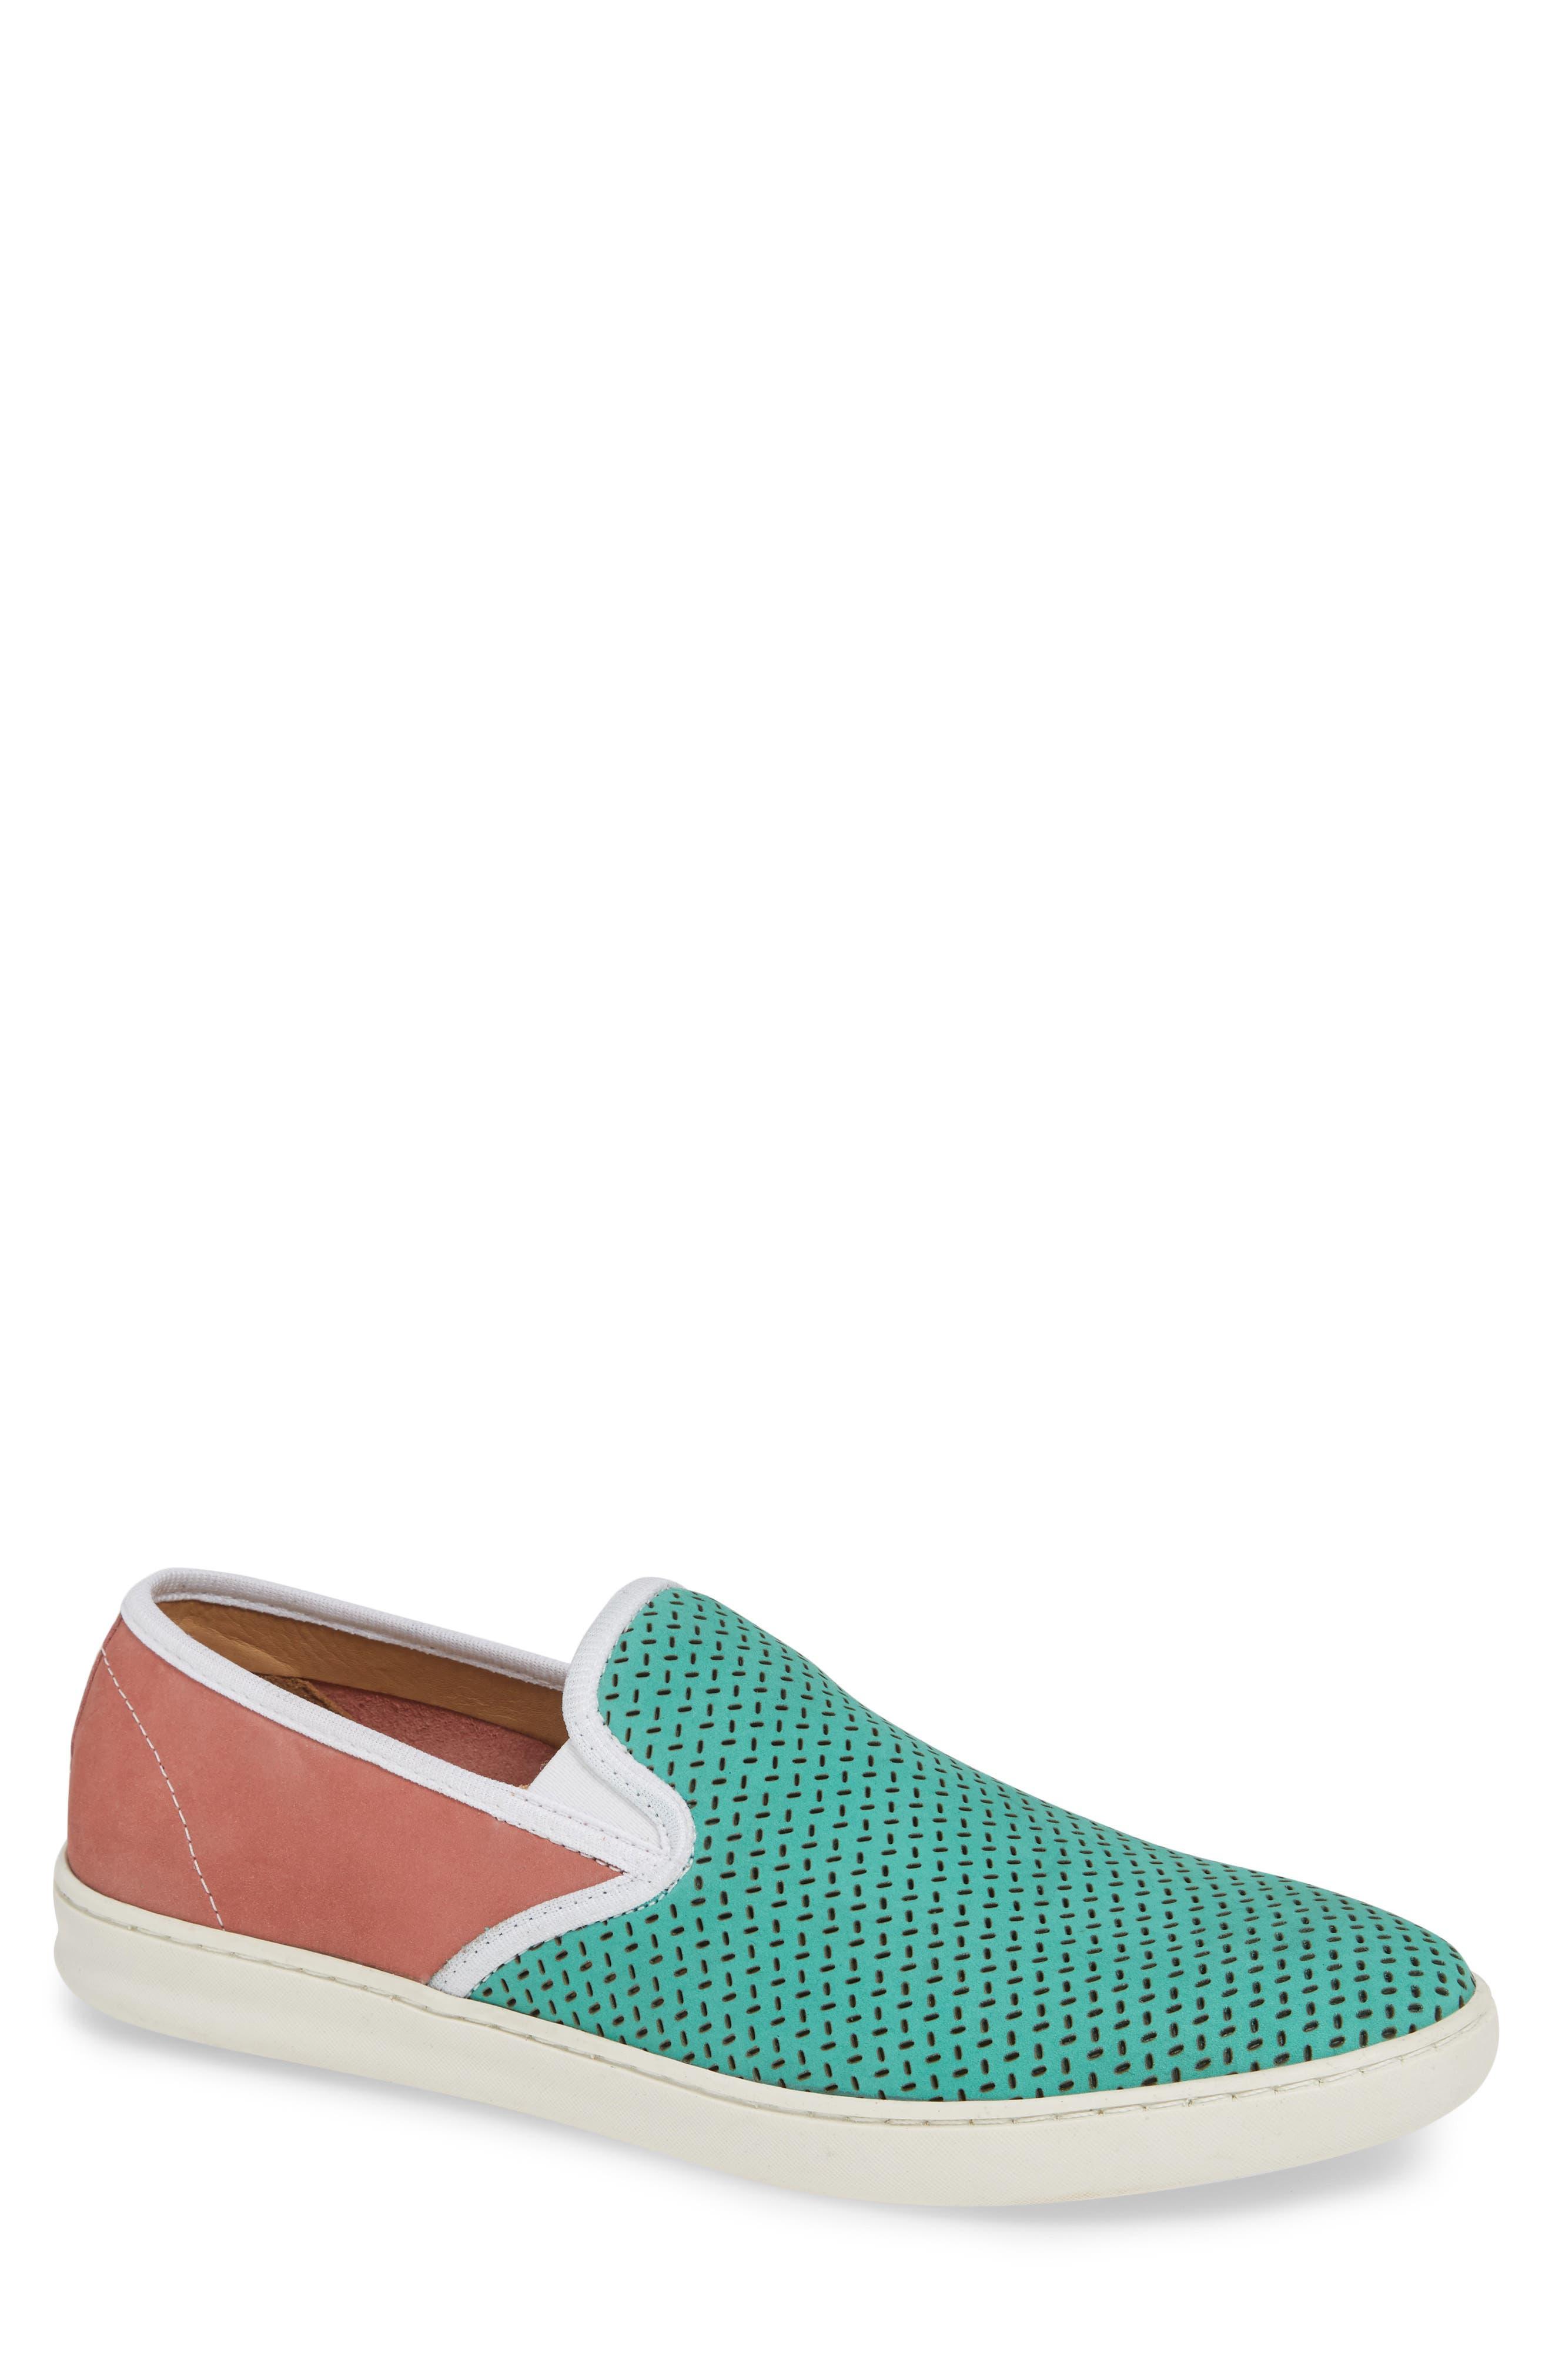 Malibu Perforated Loafer,                         Main,                         color, AQUA/PINK NUBUCK